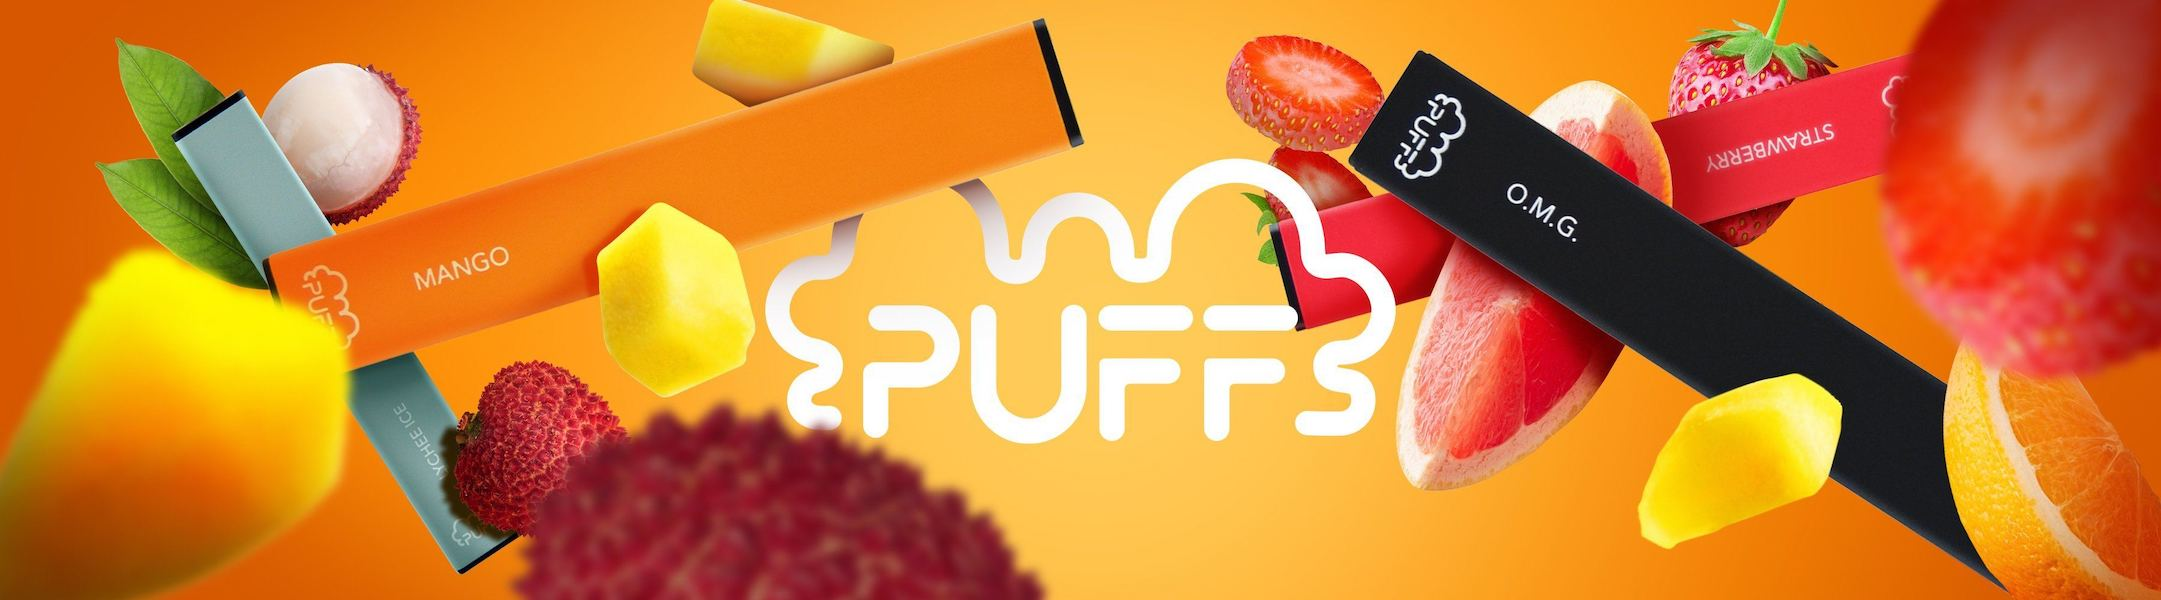 puff-bar-banner.jpg